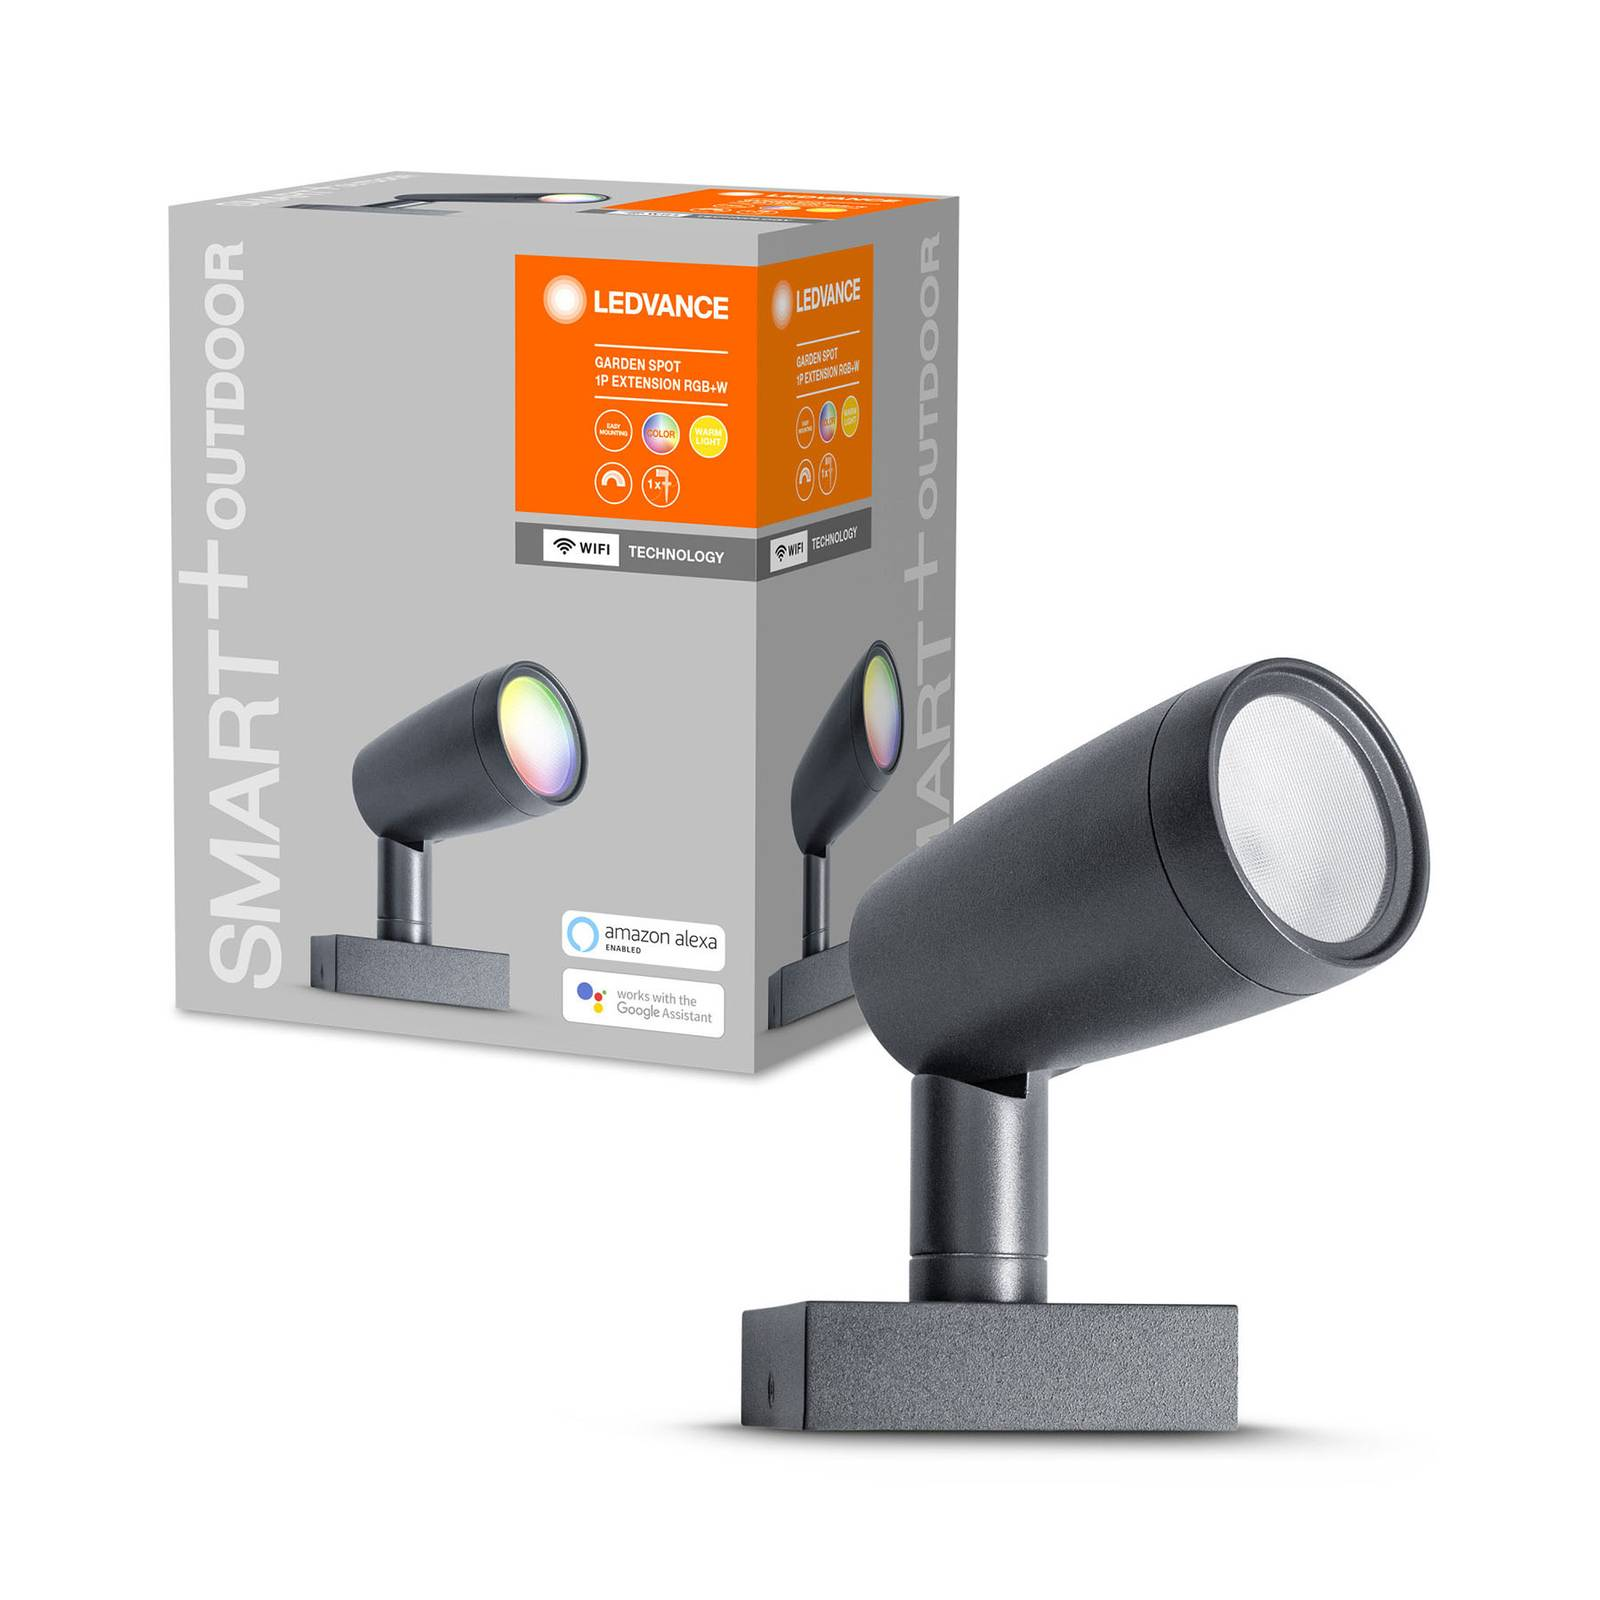 LEDVANCE SMART+WiFi Garden-spotti 1 kpl, laajennus